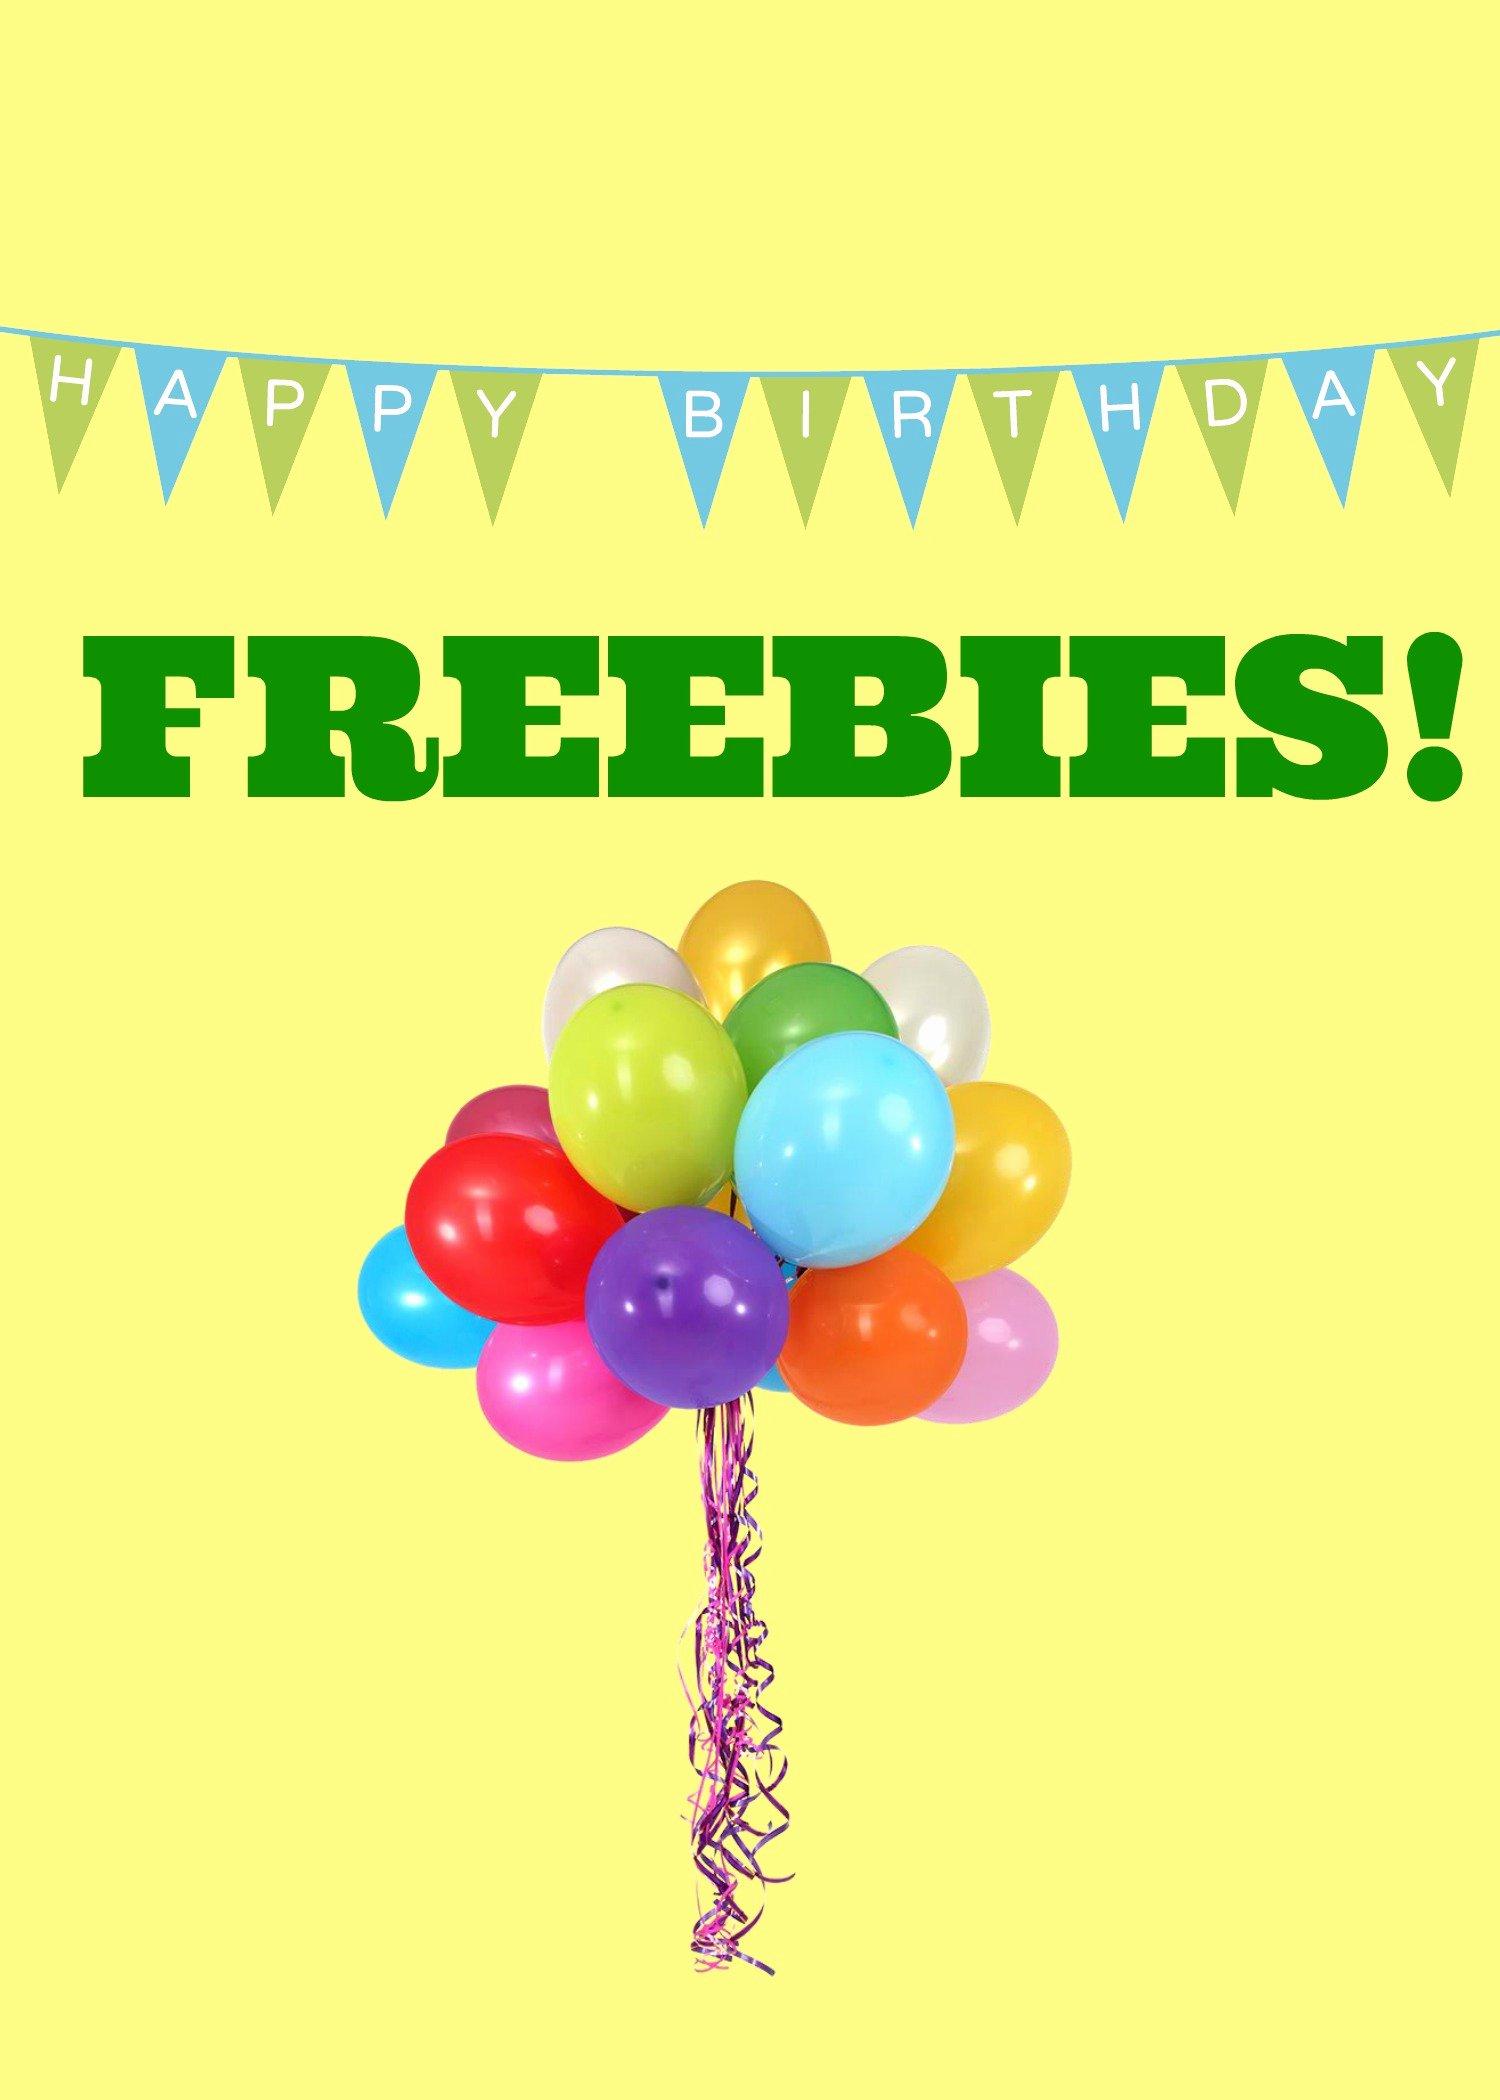 40 Free Happy Birthday Picture